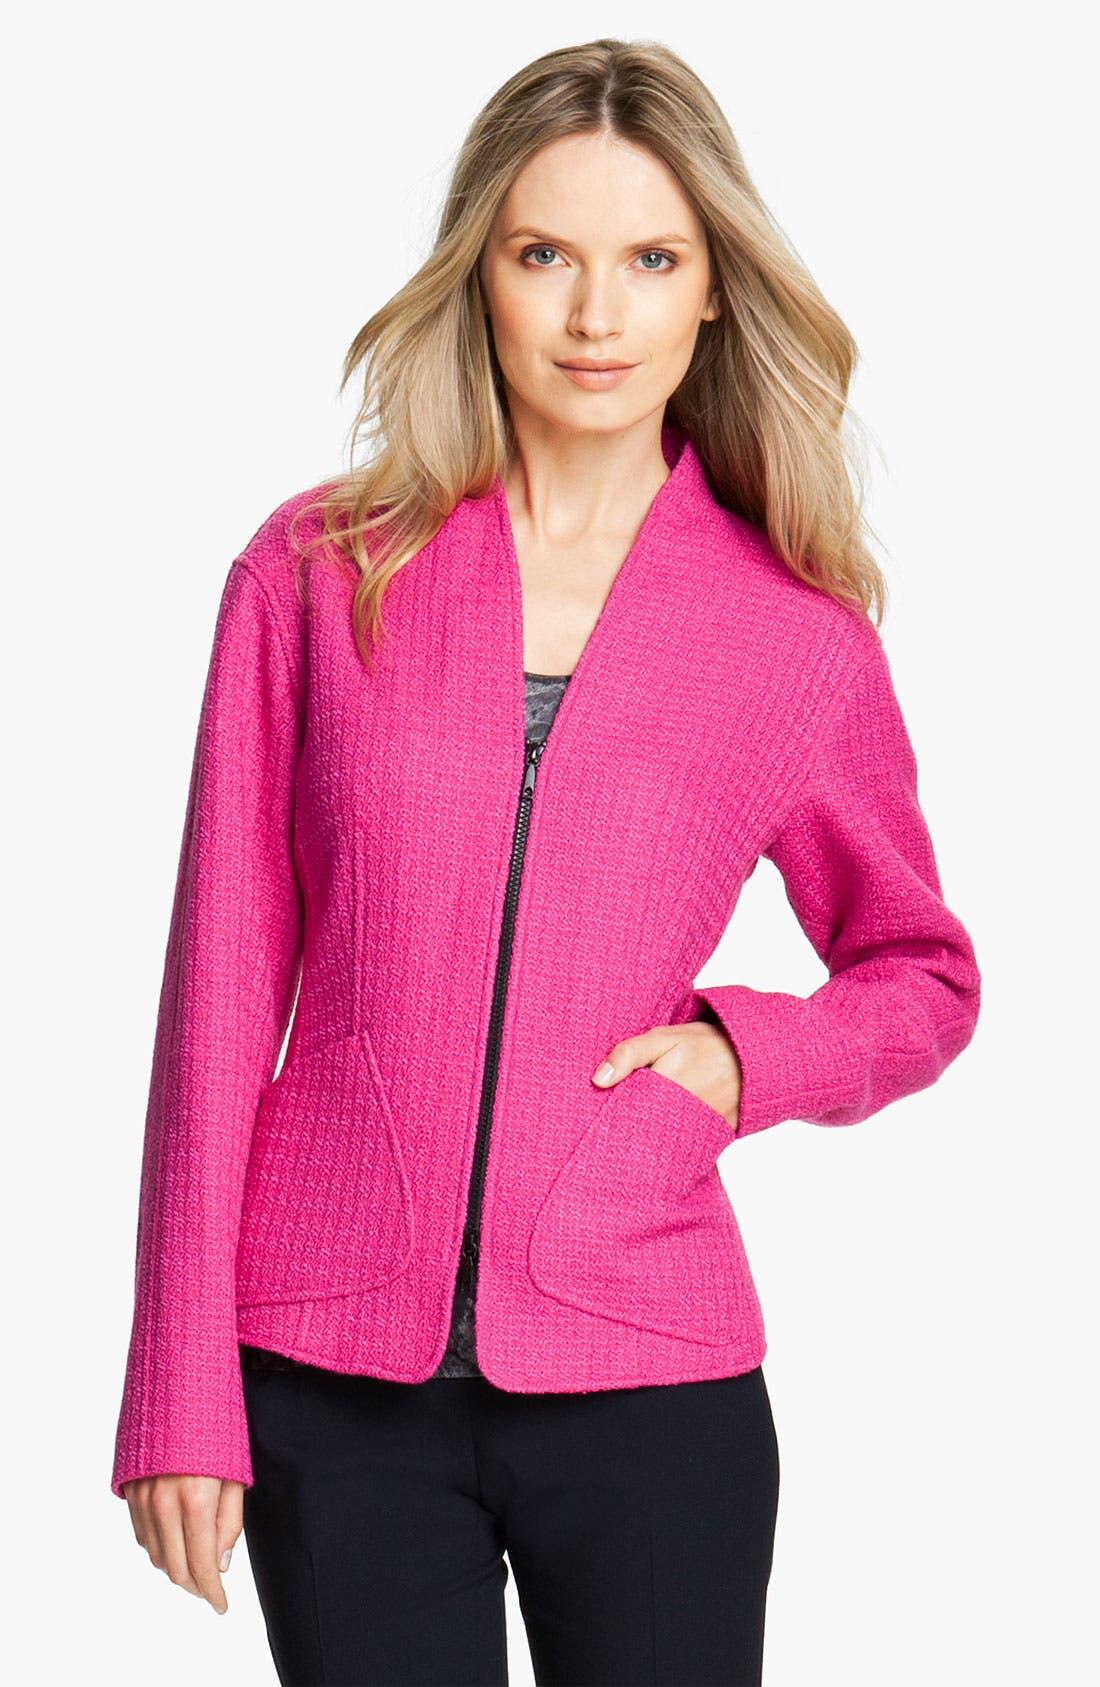 Main Image - Lafayette 148 New York 'Patricia Abbey Tweed' Jacket